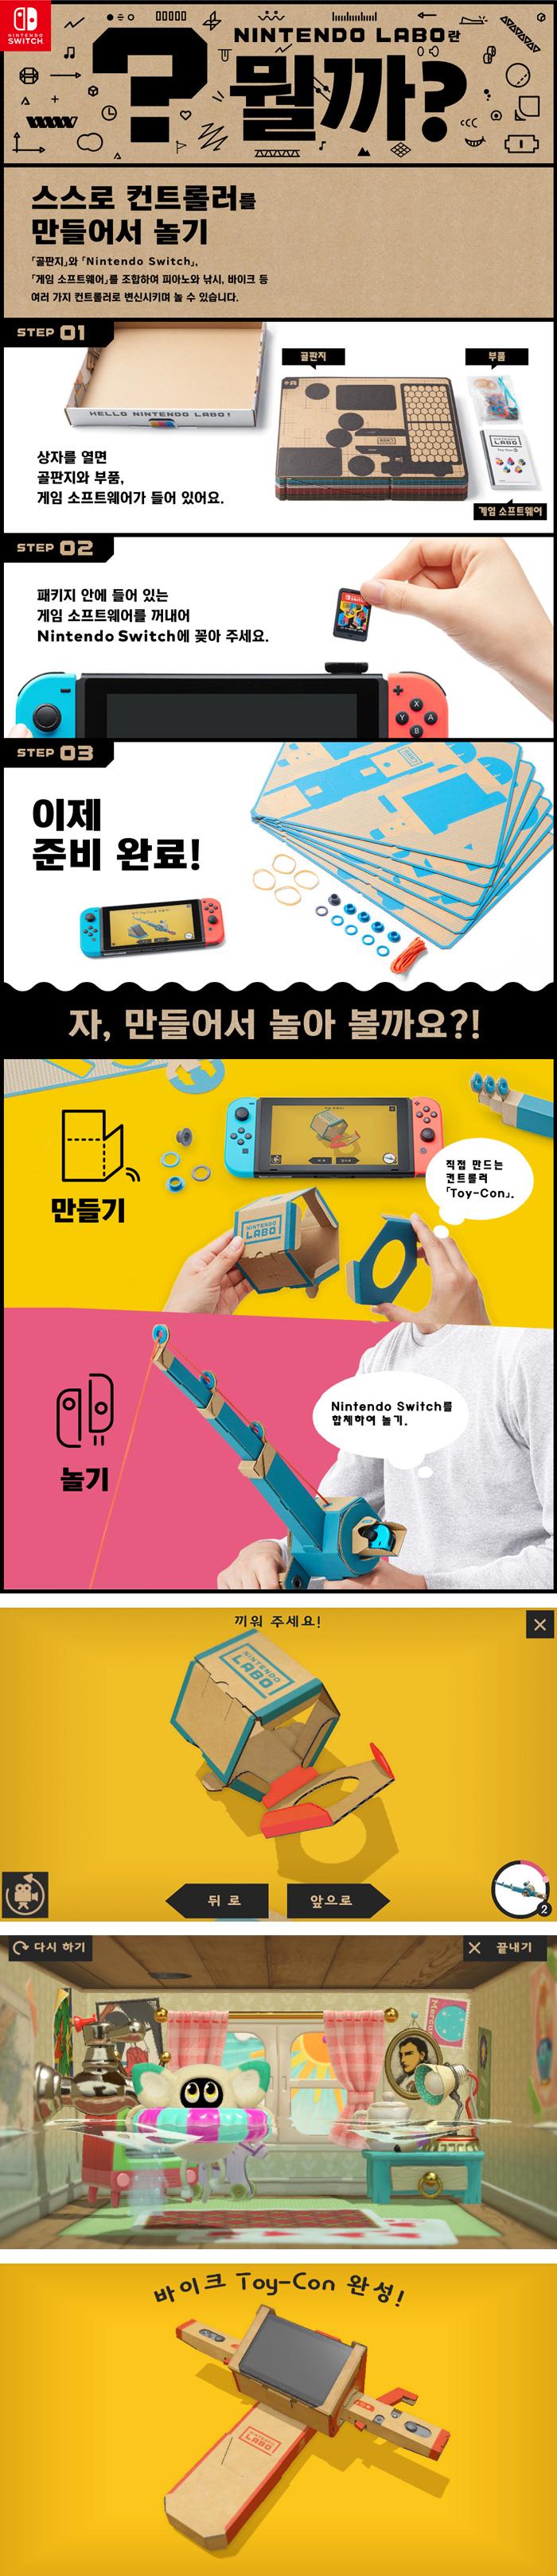 Nintendo Labo 버라이어티 키트 상세페이지